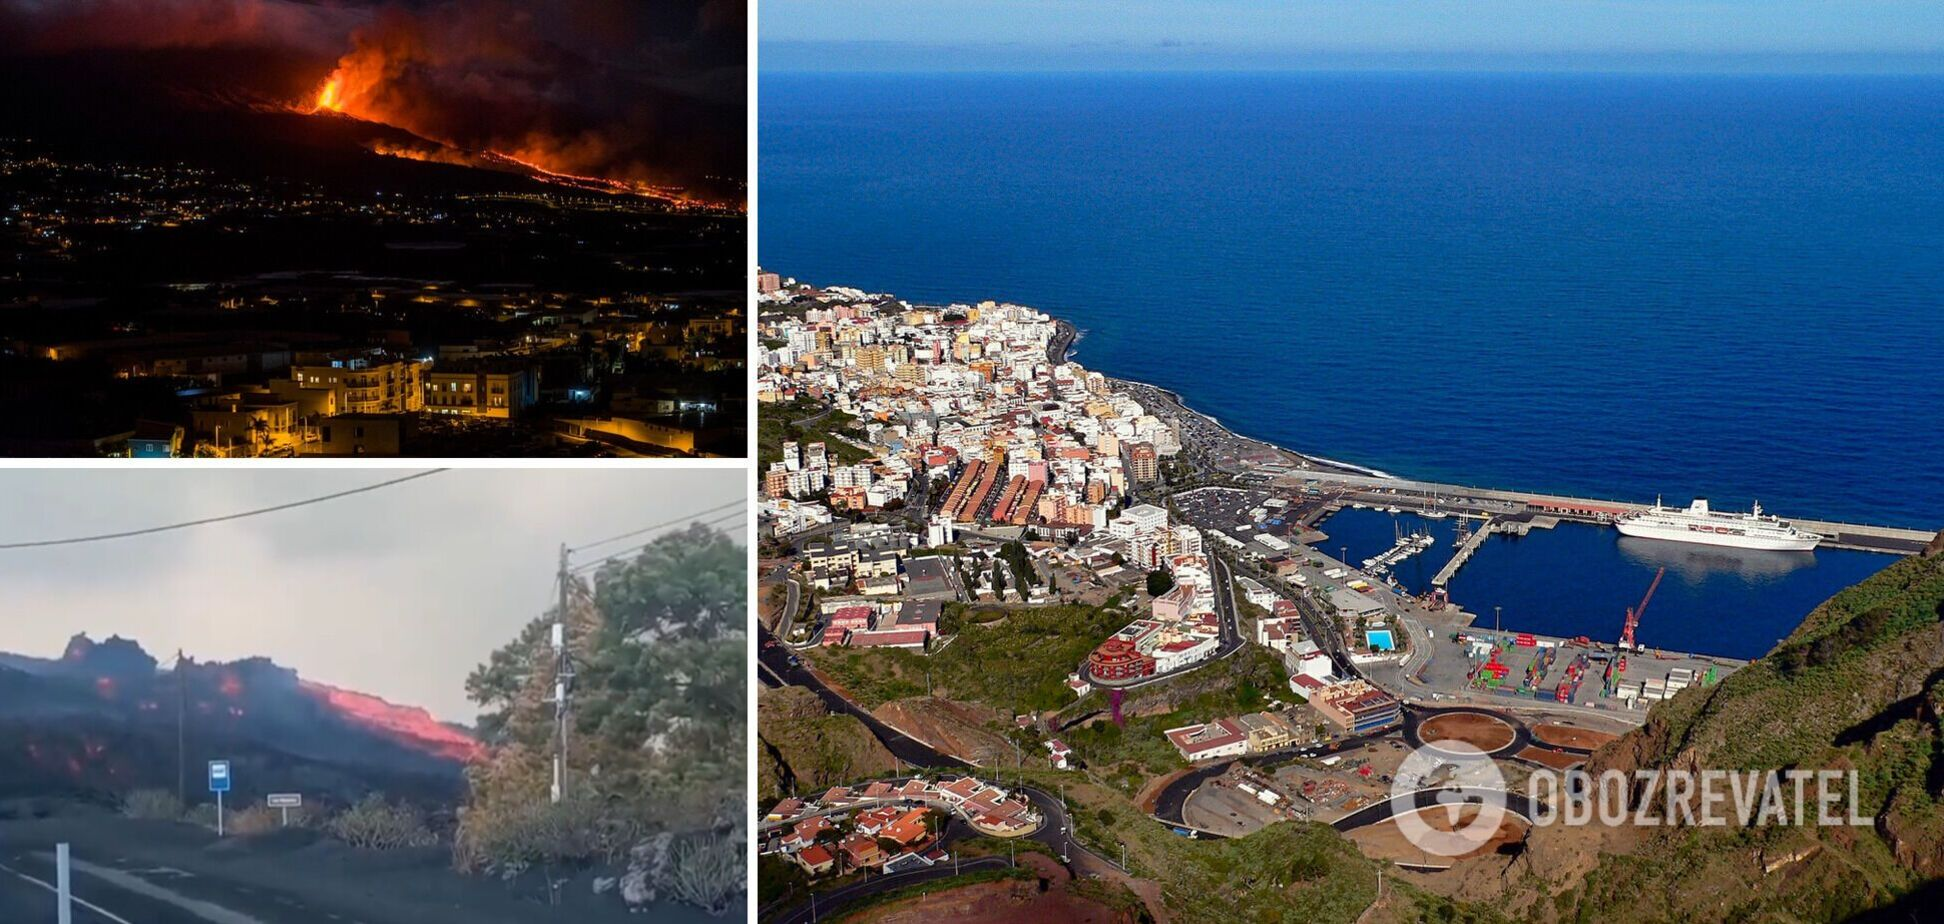 На Канарах стався новий землетрус, частина вулкана на Ла-Пальмі зруйнувалася. Відео